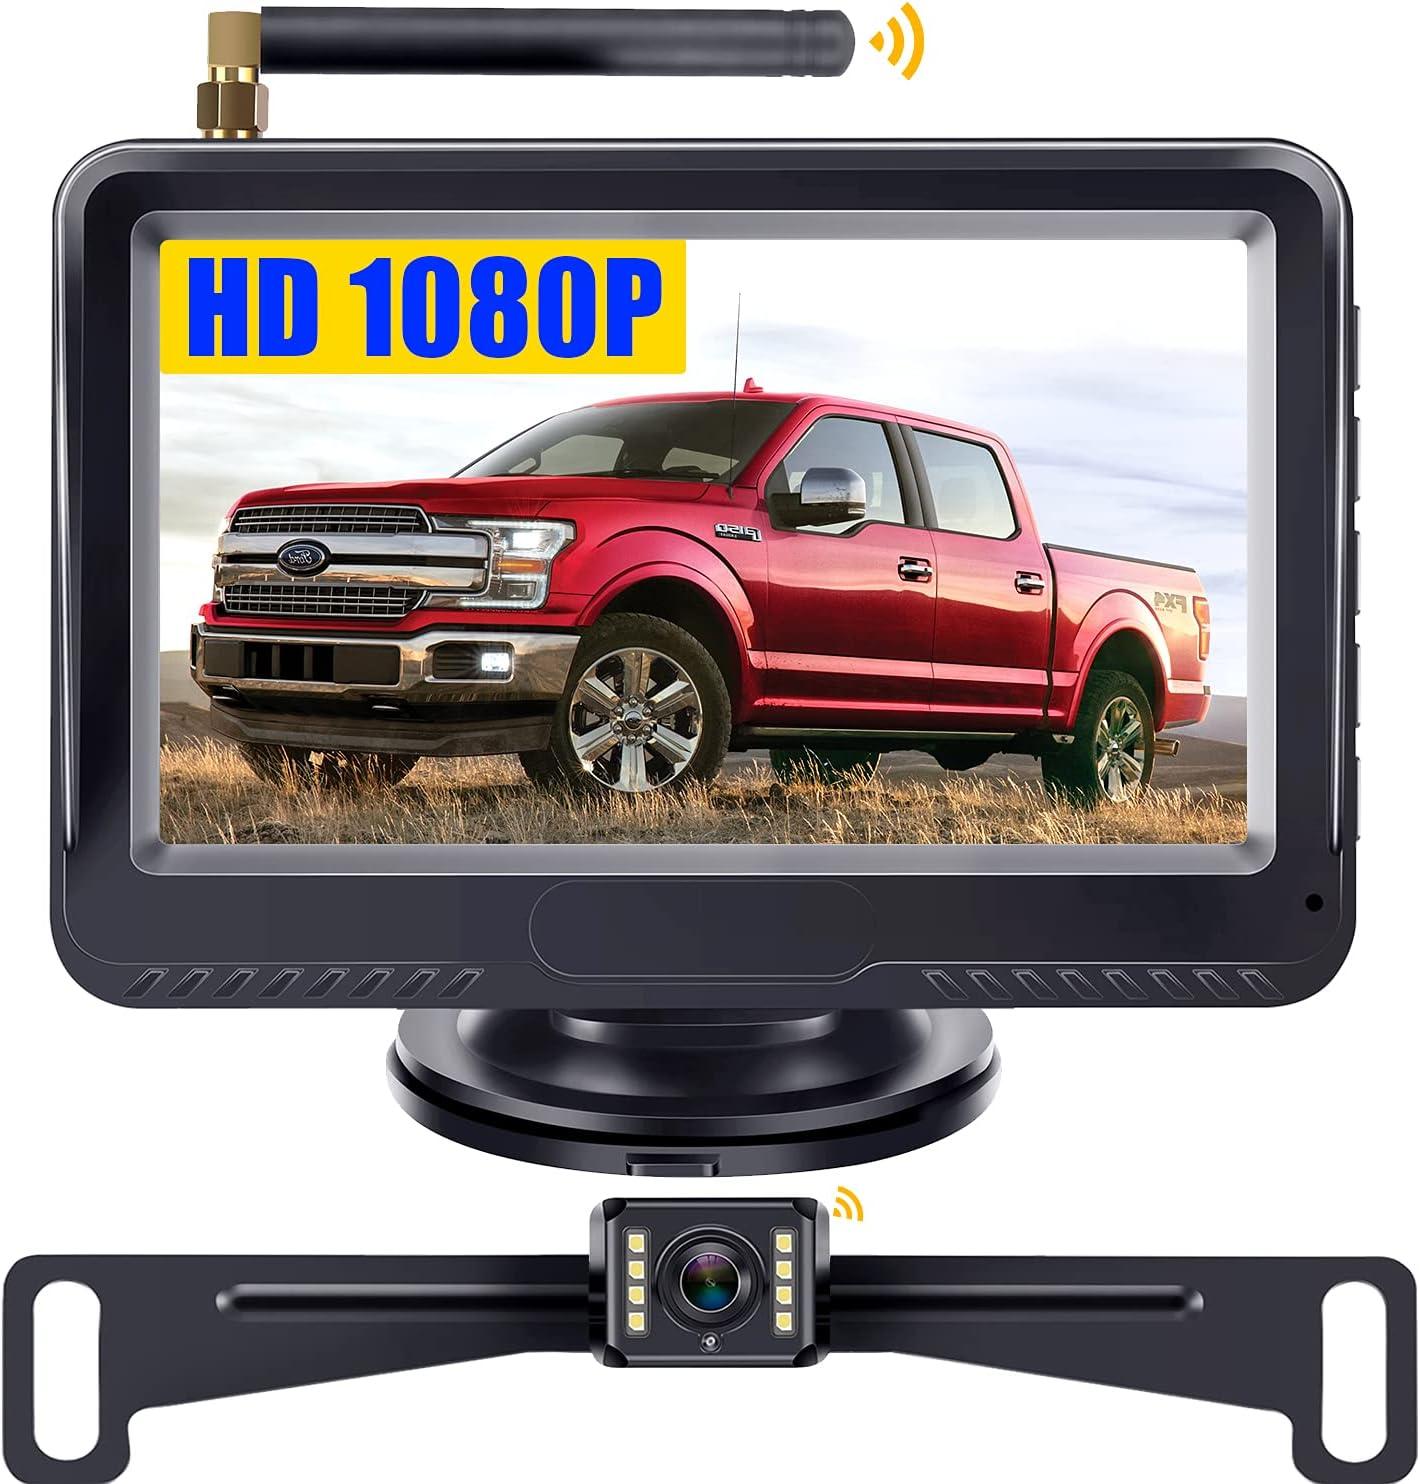 Leekoolou卡车无线备份摄像头